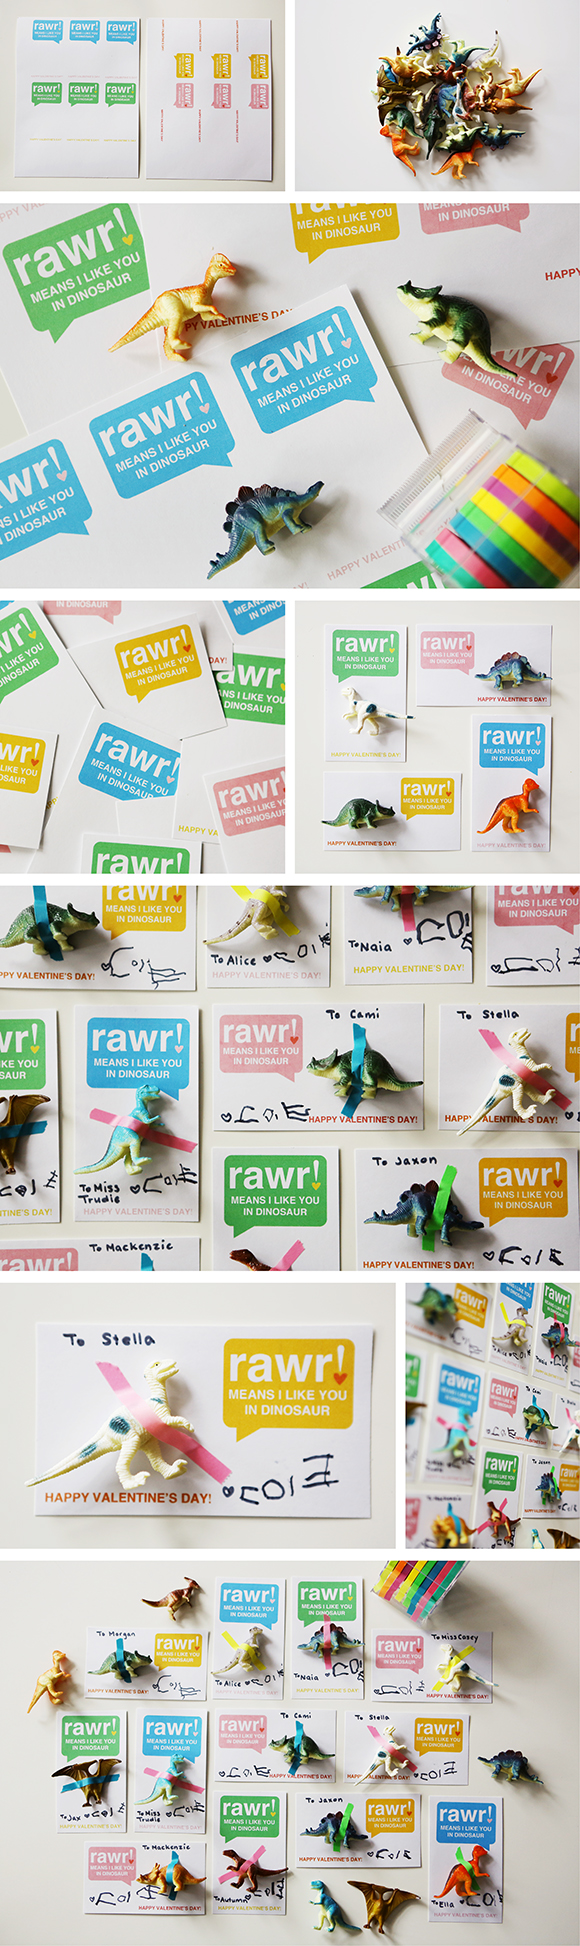 rawr-hankiland-dinosaur-vaentines